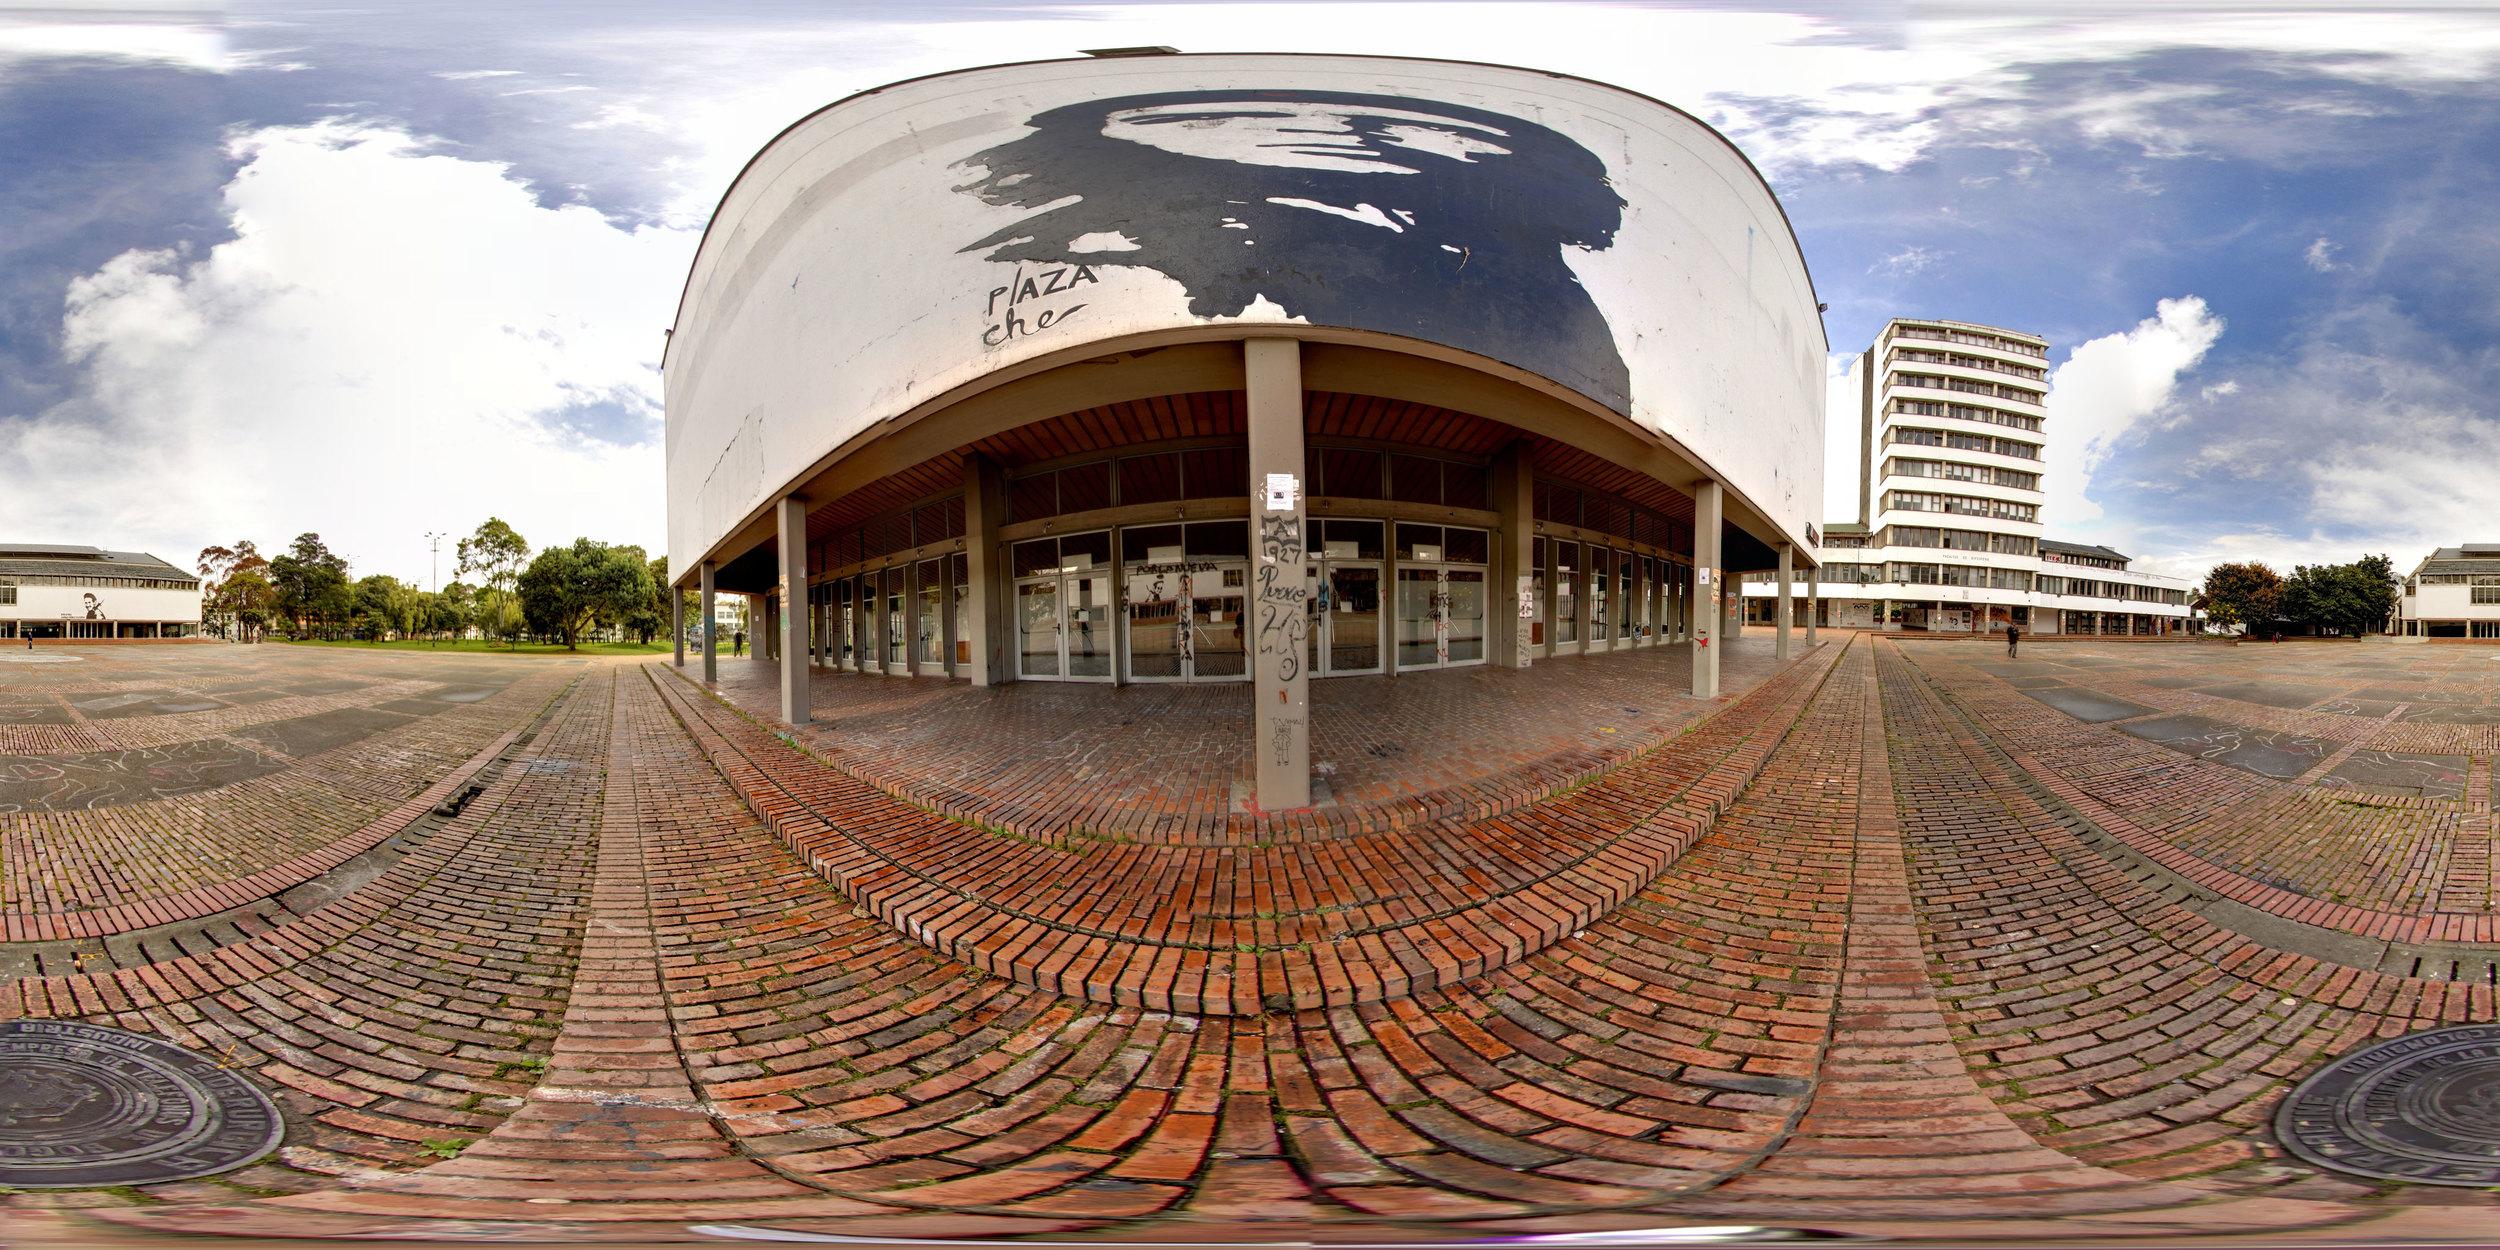 360° Plaza Che at the National Universidad de Bogotá